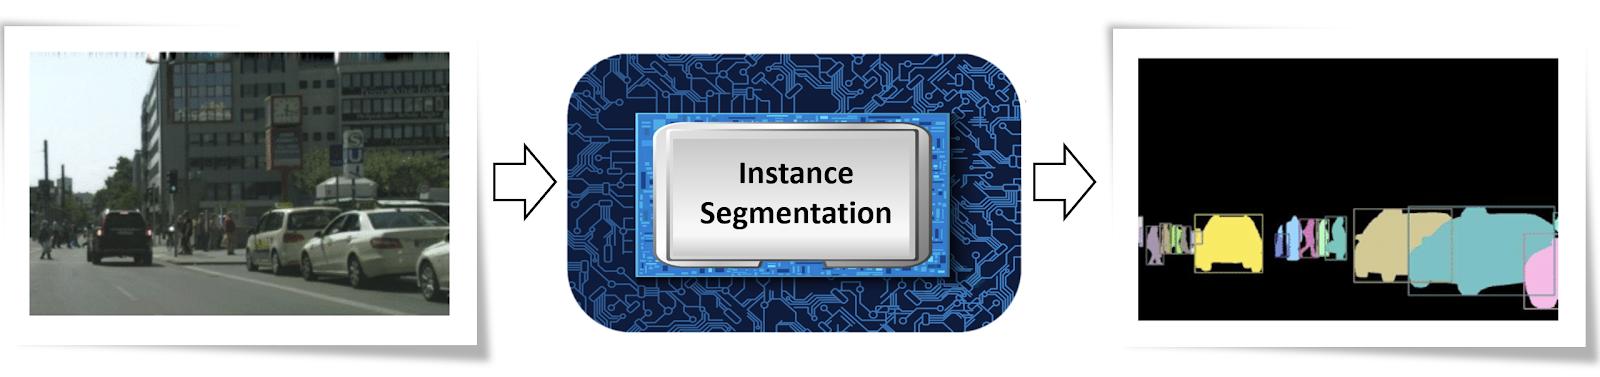 Instance Segmentation